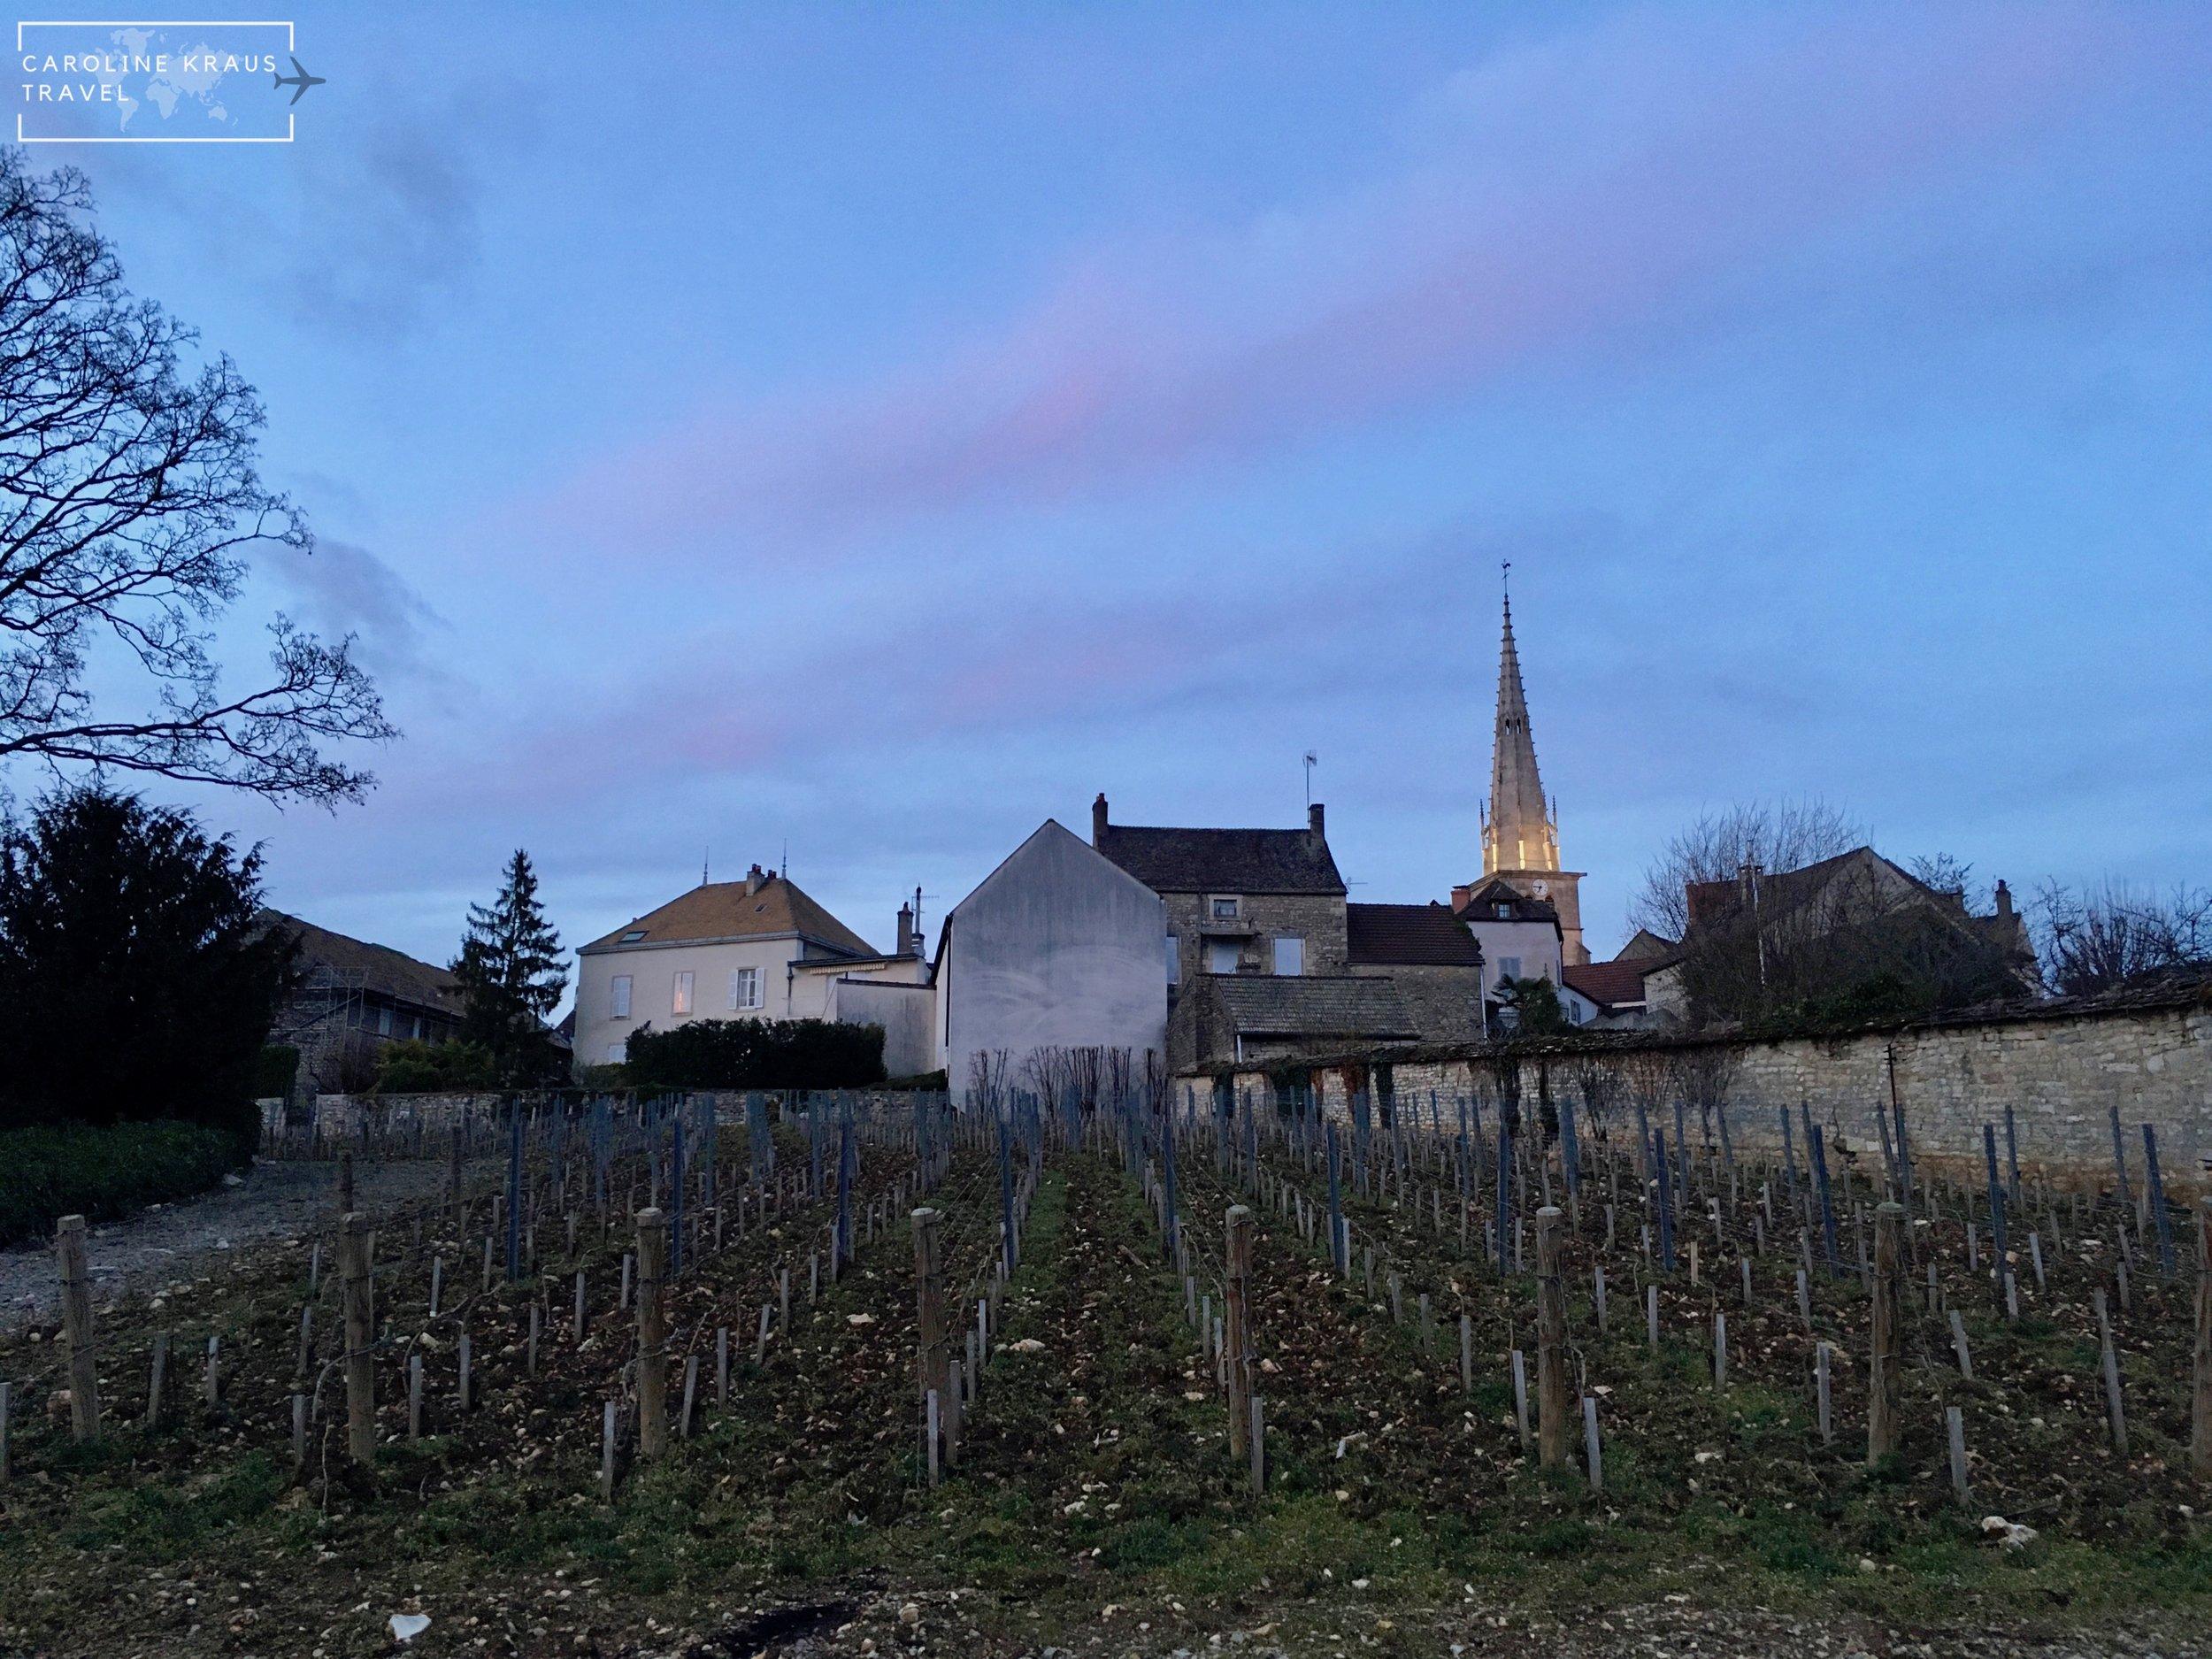 The other backyard vineyard at dusk